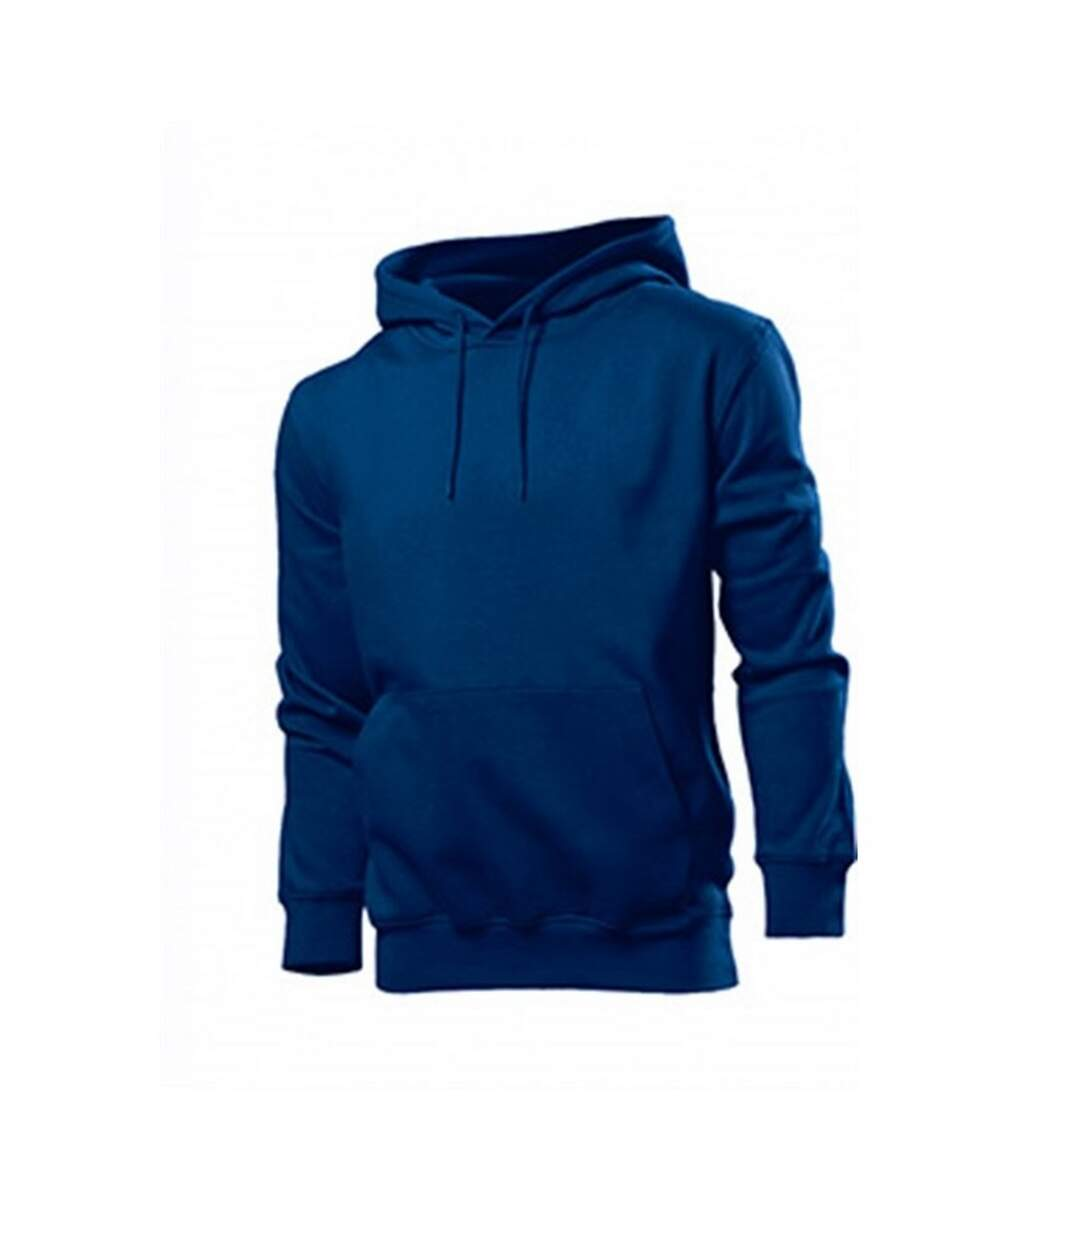 Stedman - Sweat-Shirt À Capuche Classique - Homme (Bleu marine) - UTAB287